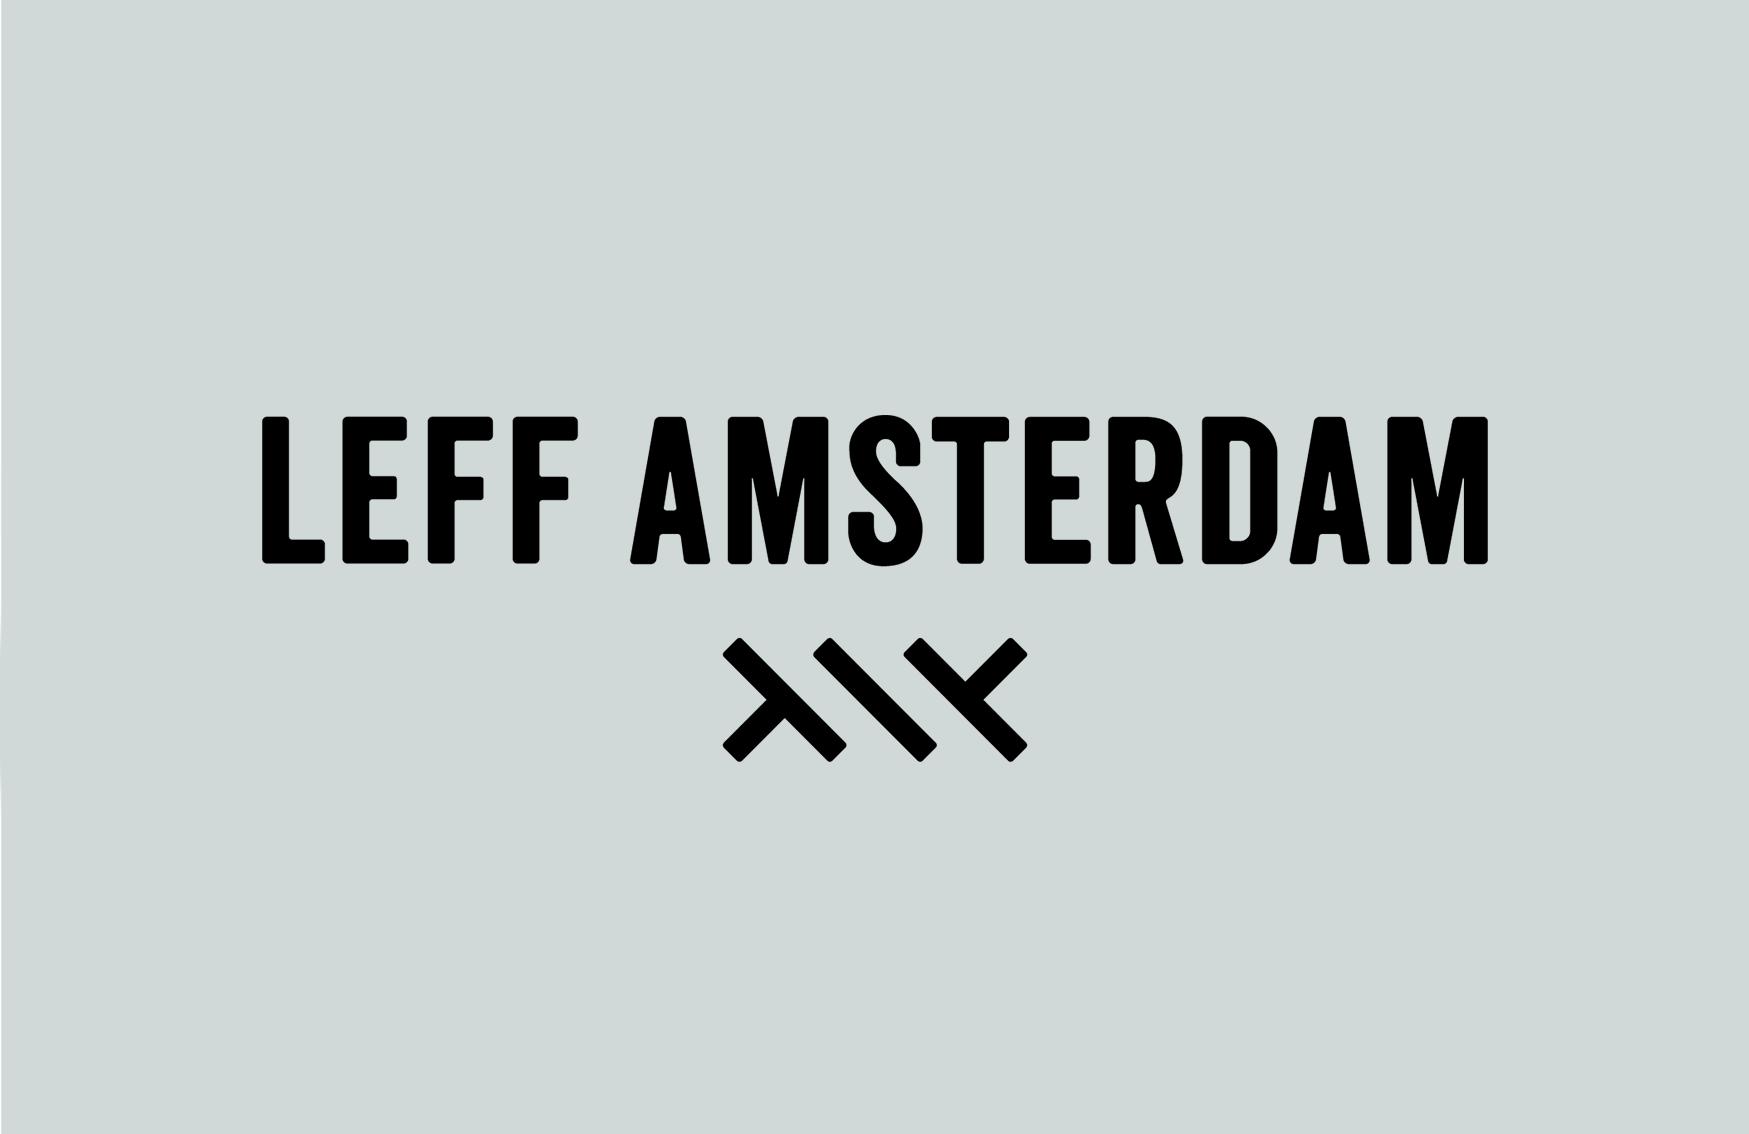 LEFF AMSTERDAM